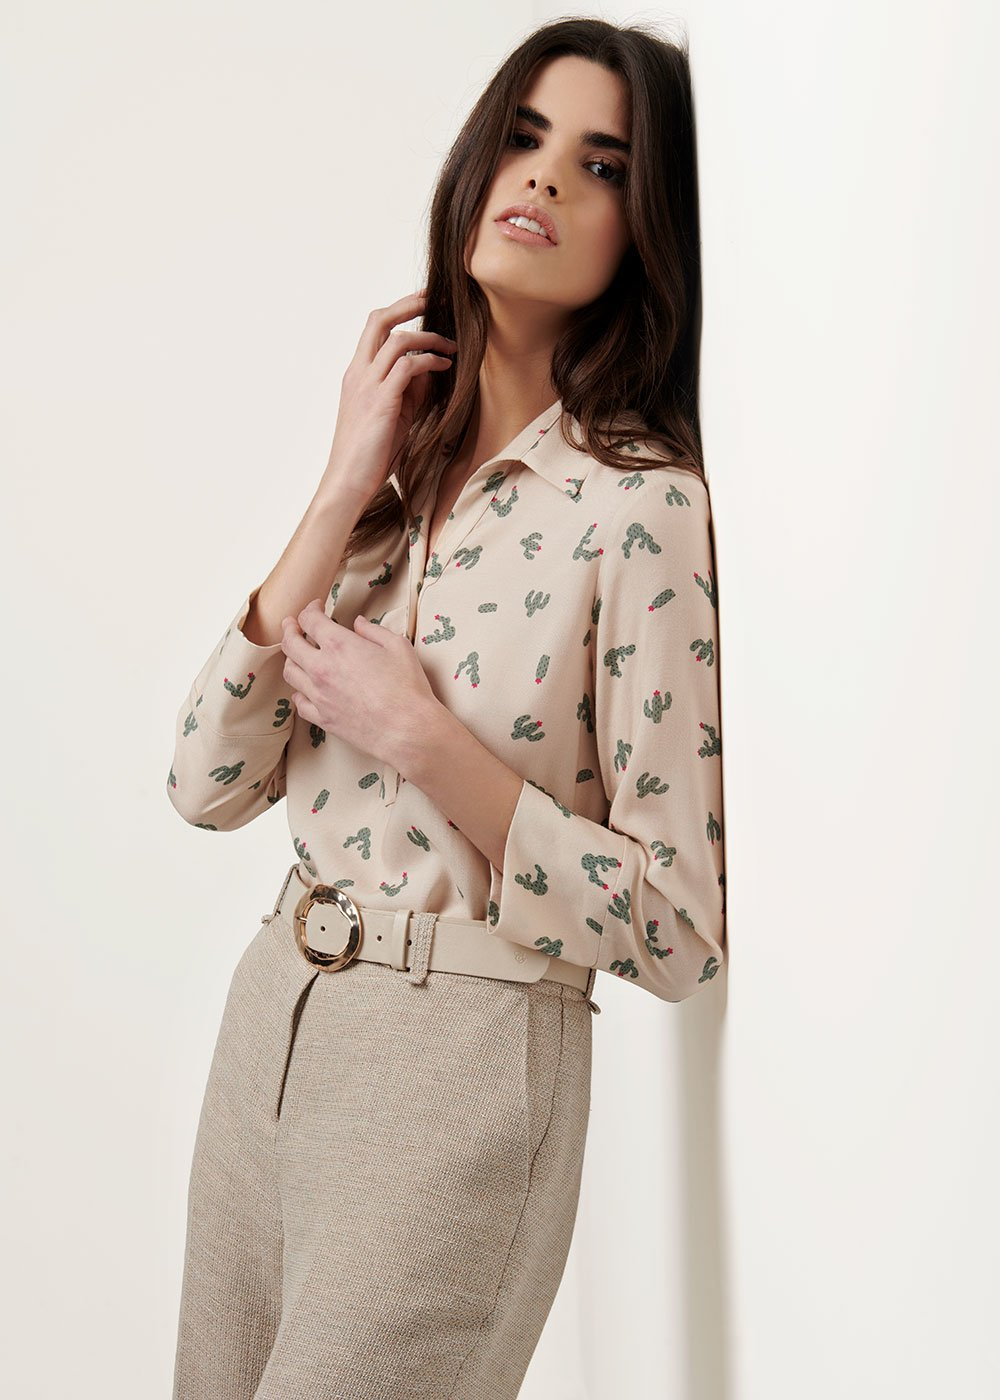 Angela shirt with cactus print - Beige / Timo Fantasia - Woman